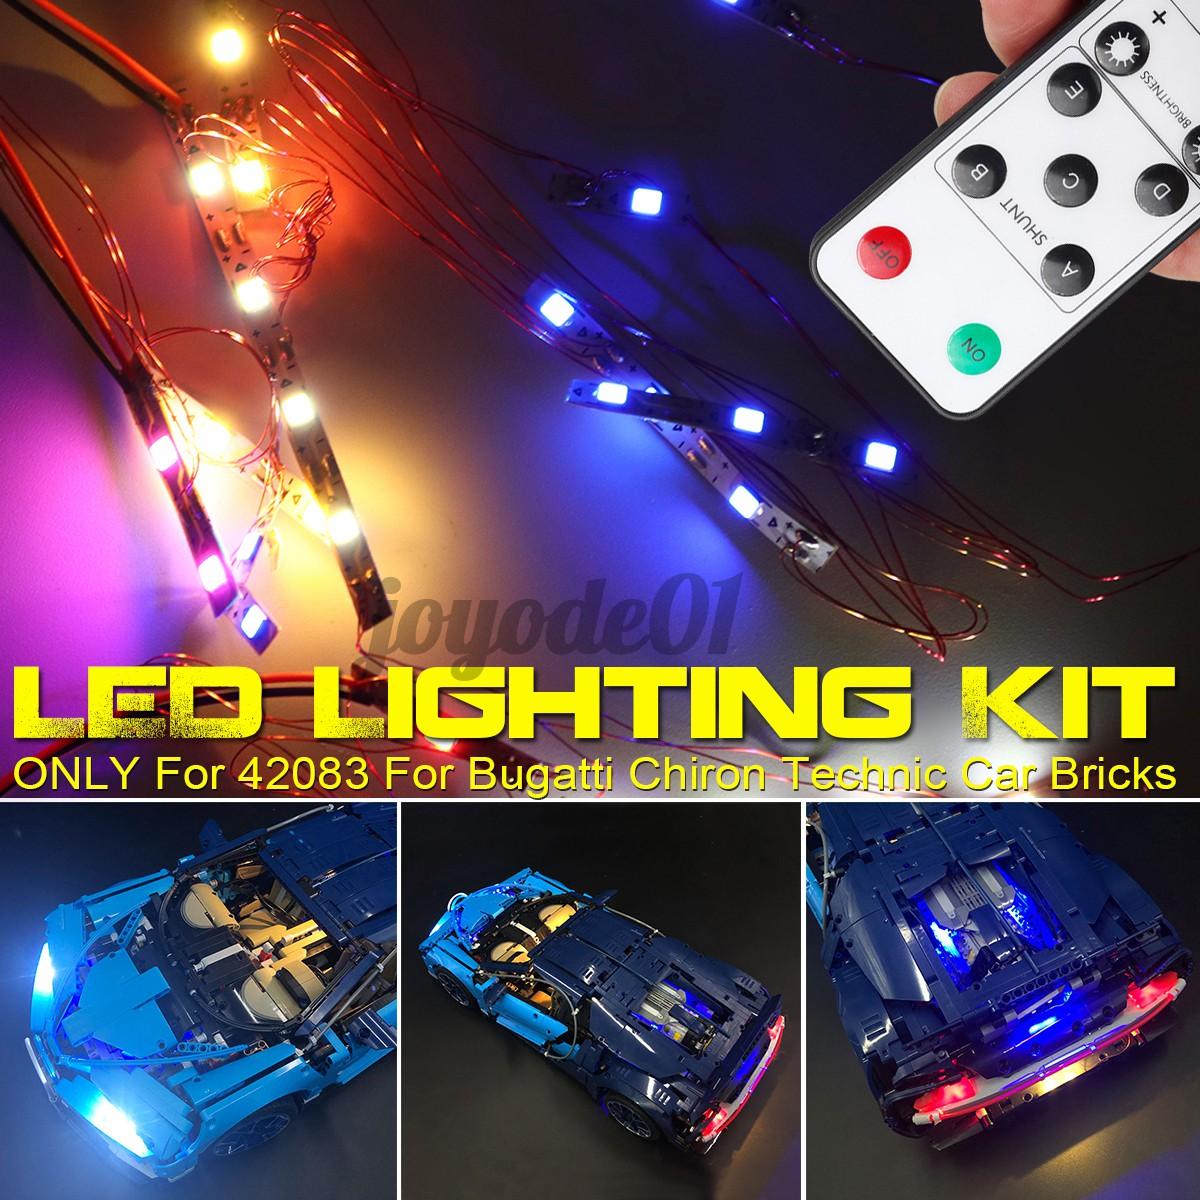 Kit De Luz Led So Controle Remoto Para Lego 42083 Bugatti Chiron Technic Shopee Brasil